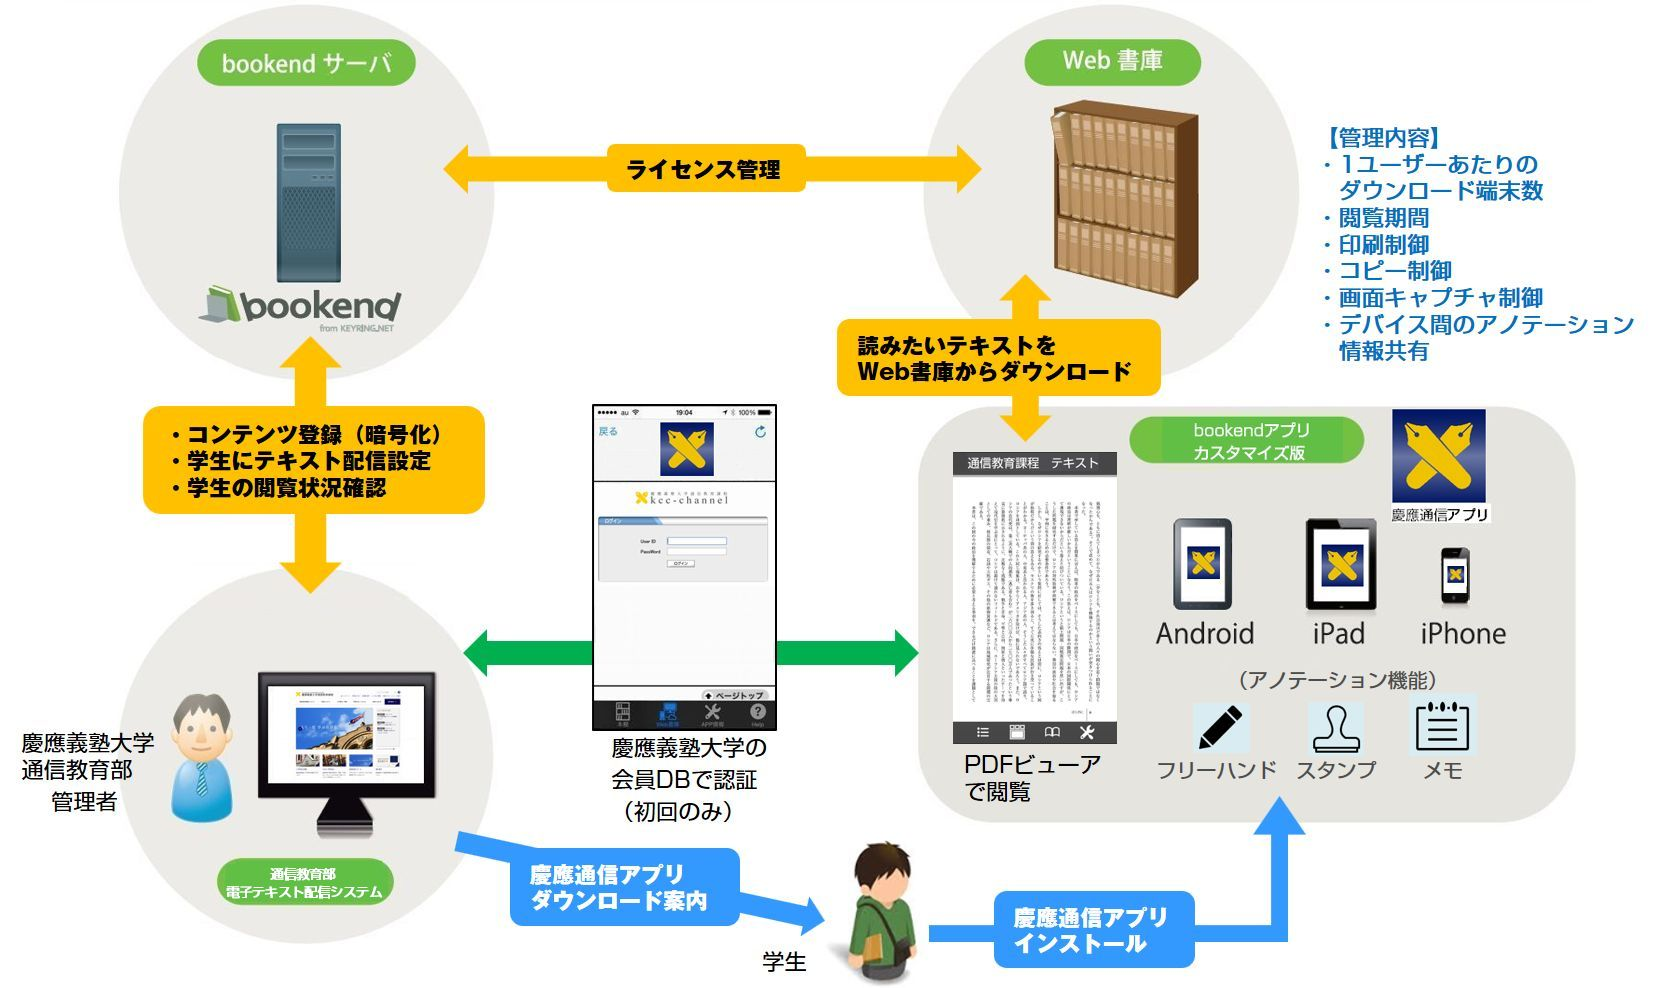 慶應義塾大学通信教育部様 システム図